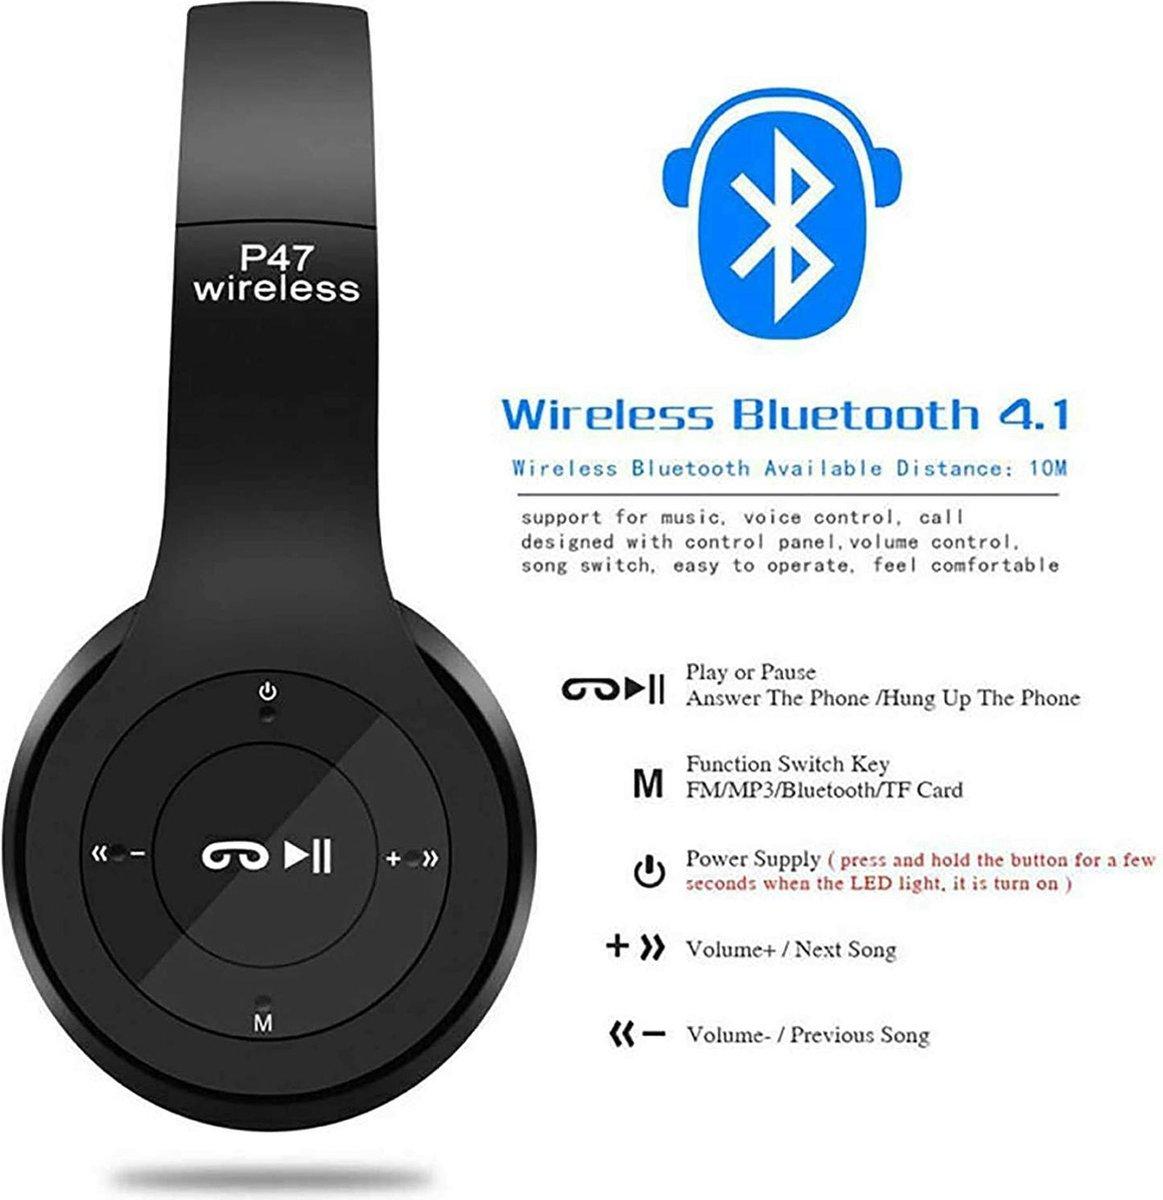 ZORIX®-P47 draadloze stereo hoofdtelefoon ,  4-in-1 multi-functionele stereo Bluetooth headset, 3,5 mm Jack ingang-Zwart